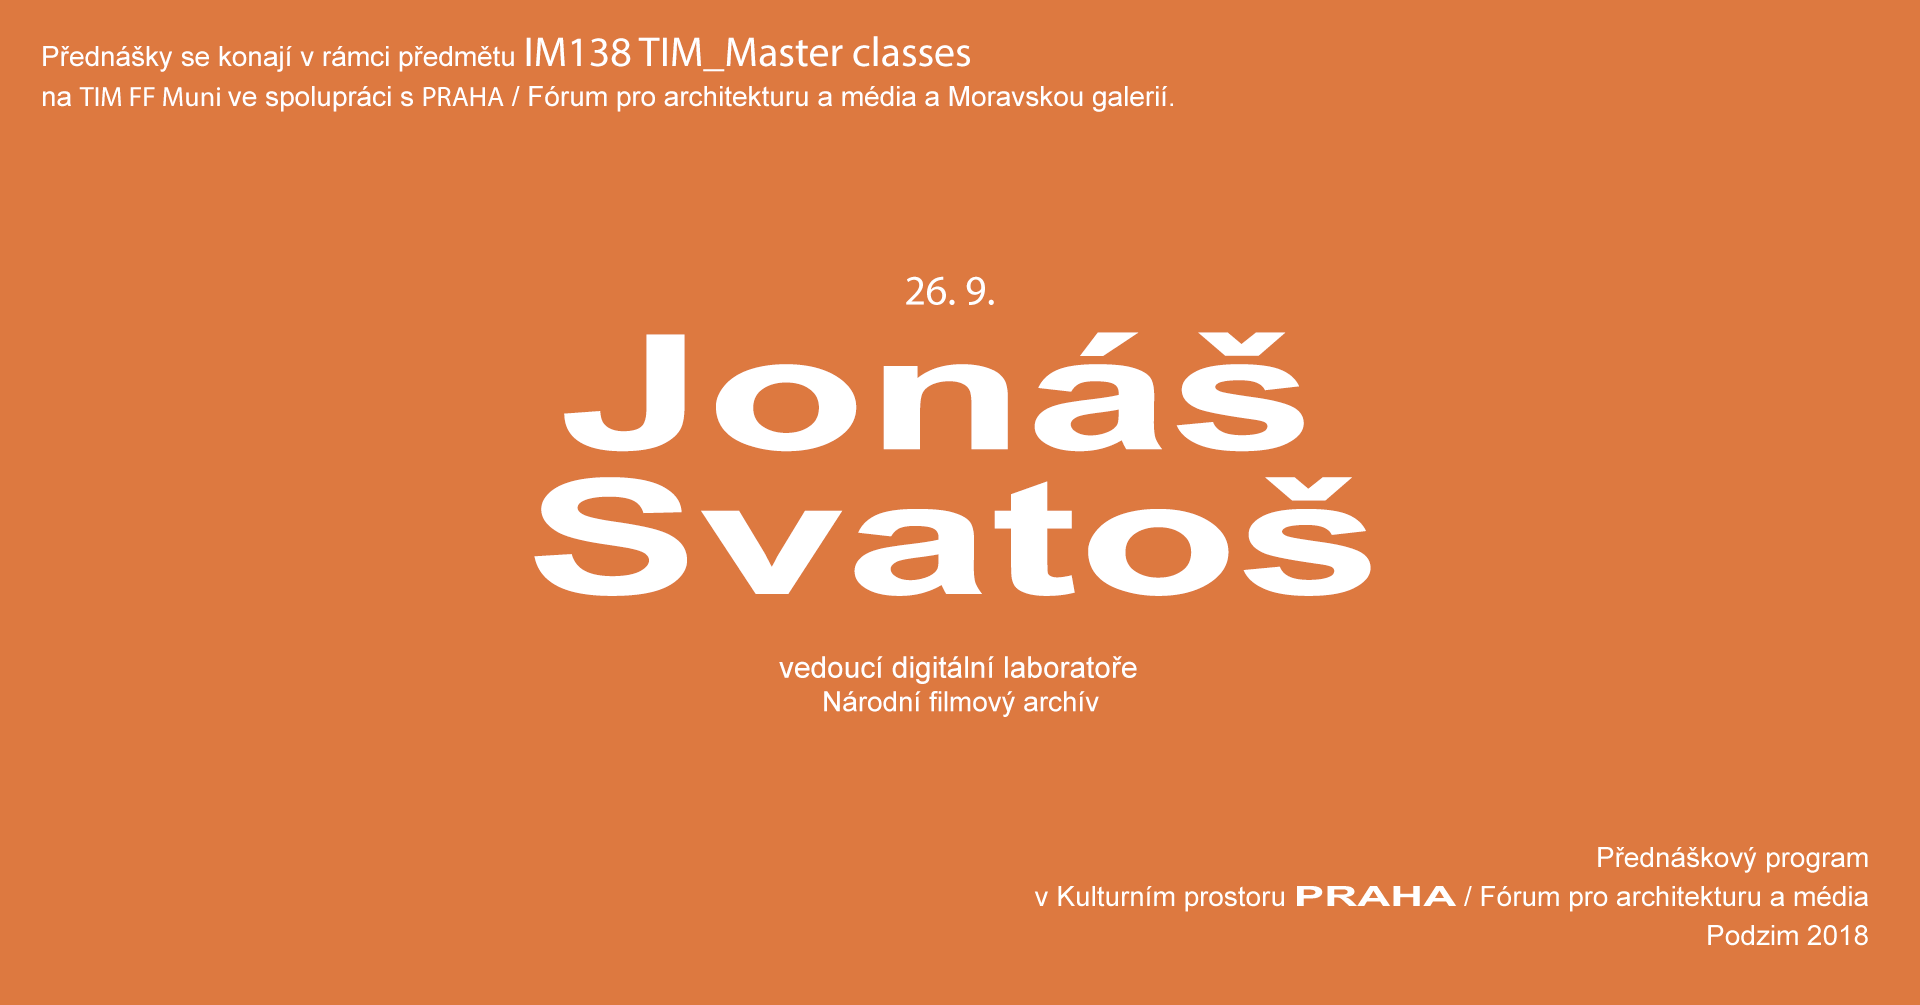 ST / 26.9. / 19.00 / TIM Panel: Jonáš Svatoš / přednáška, diskuse